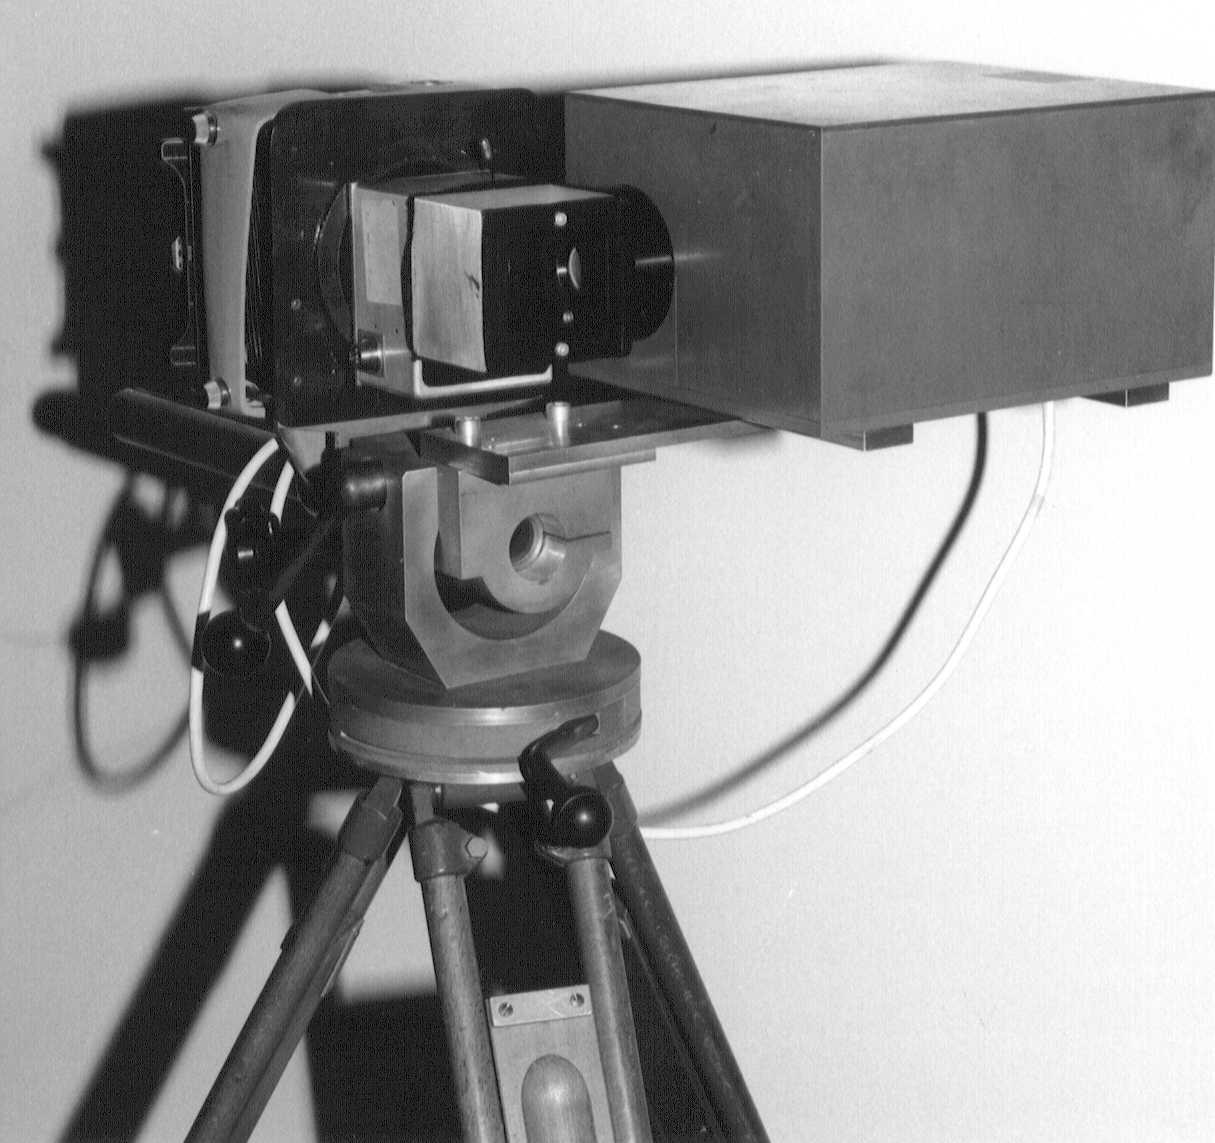 Spark flash camera